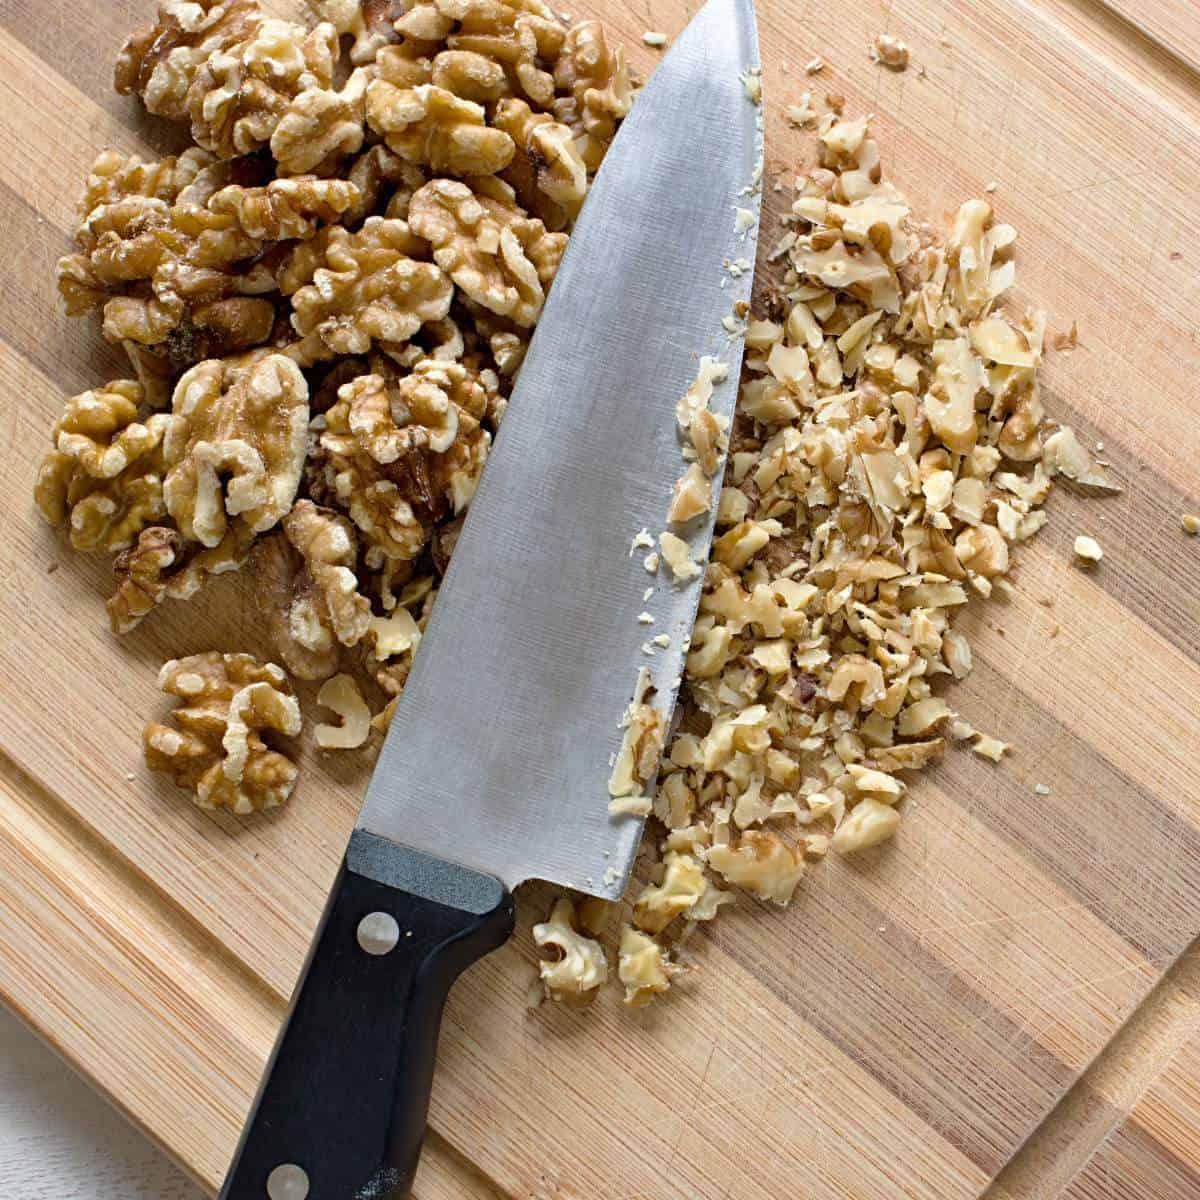 Chopping walnuts.